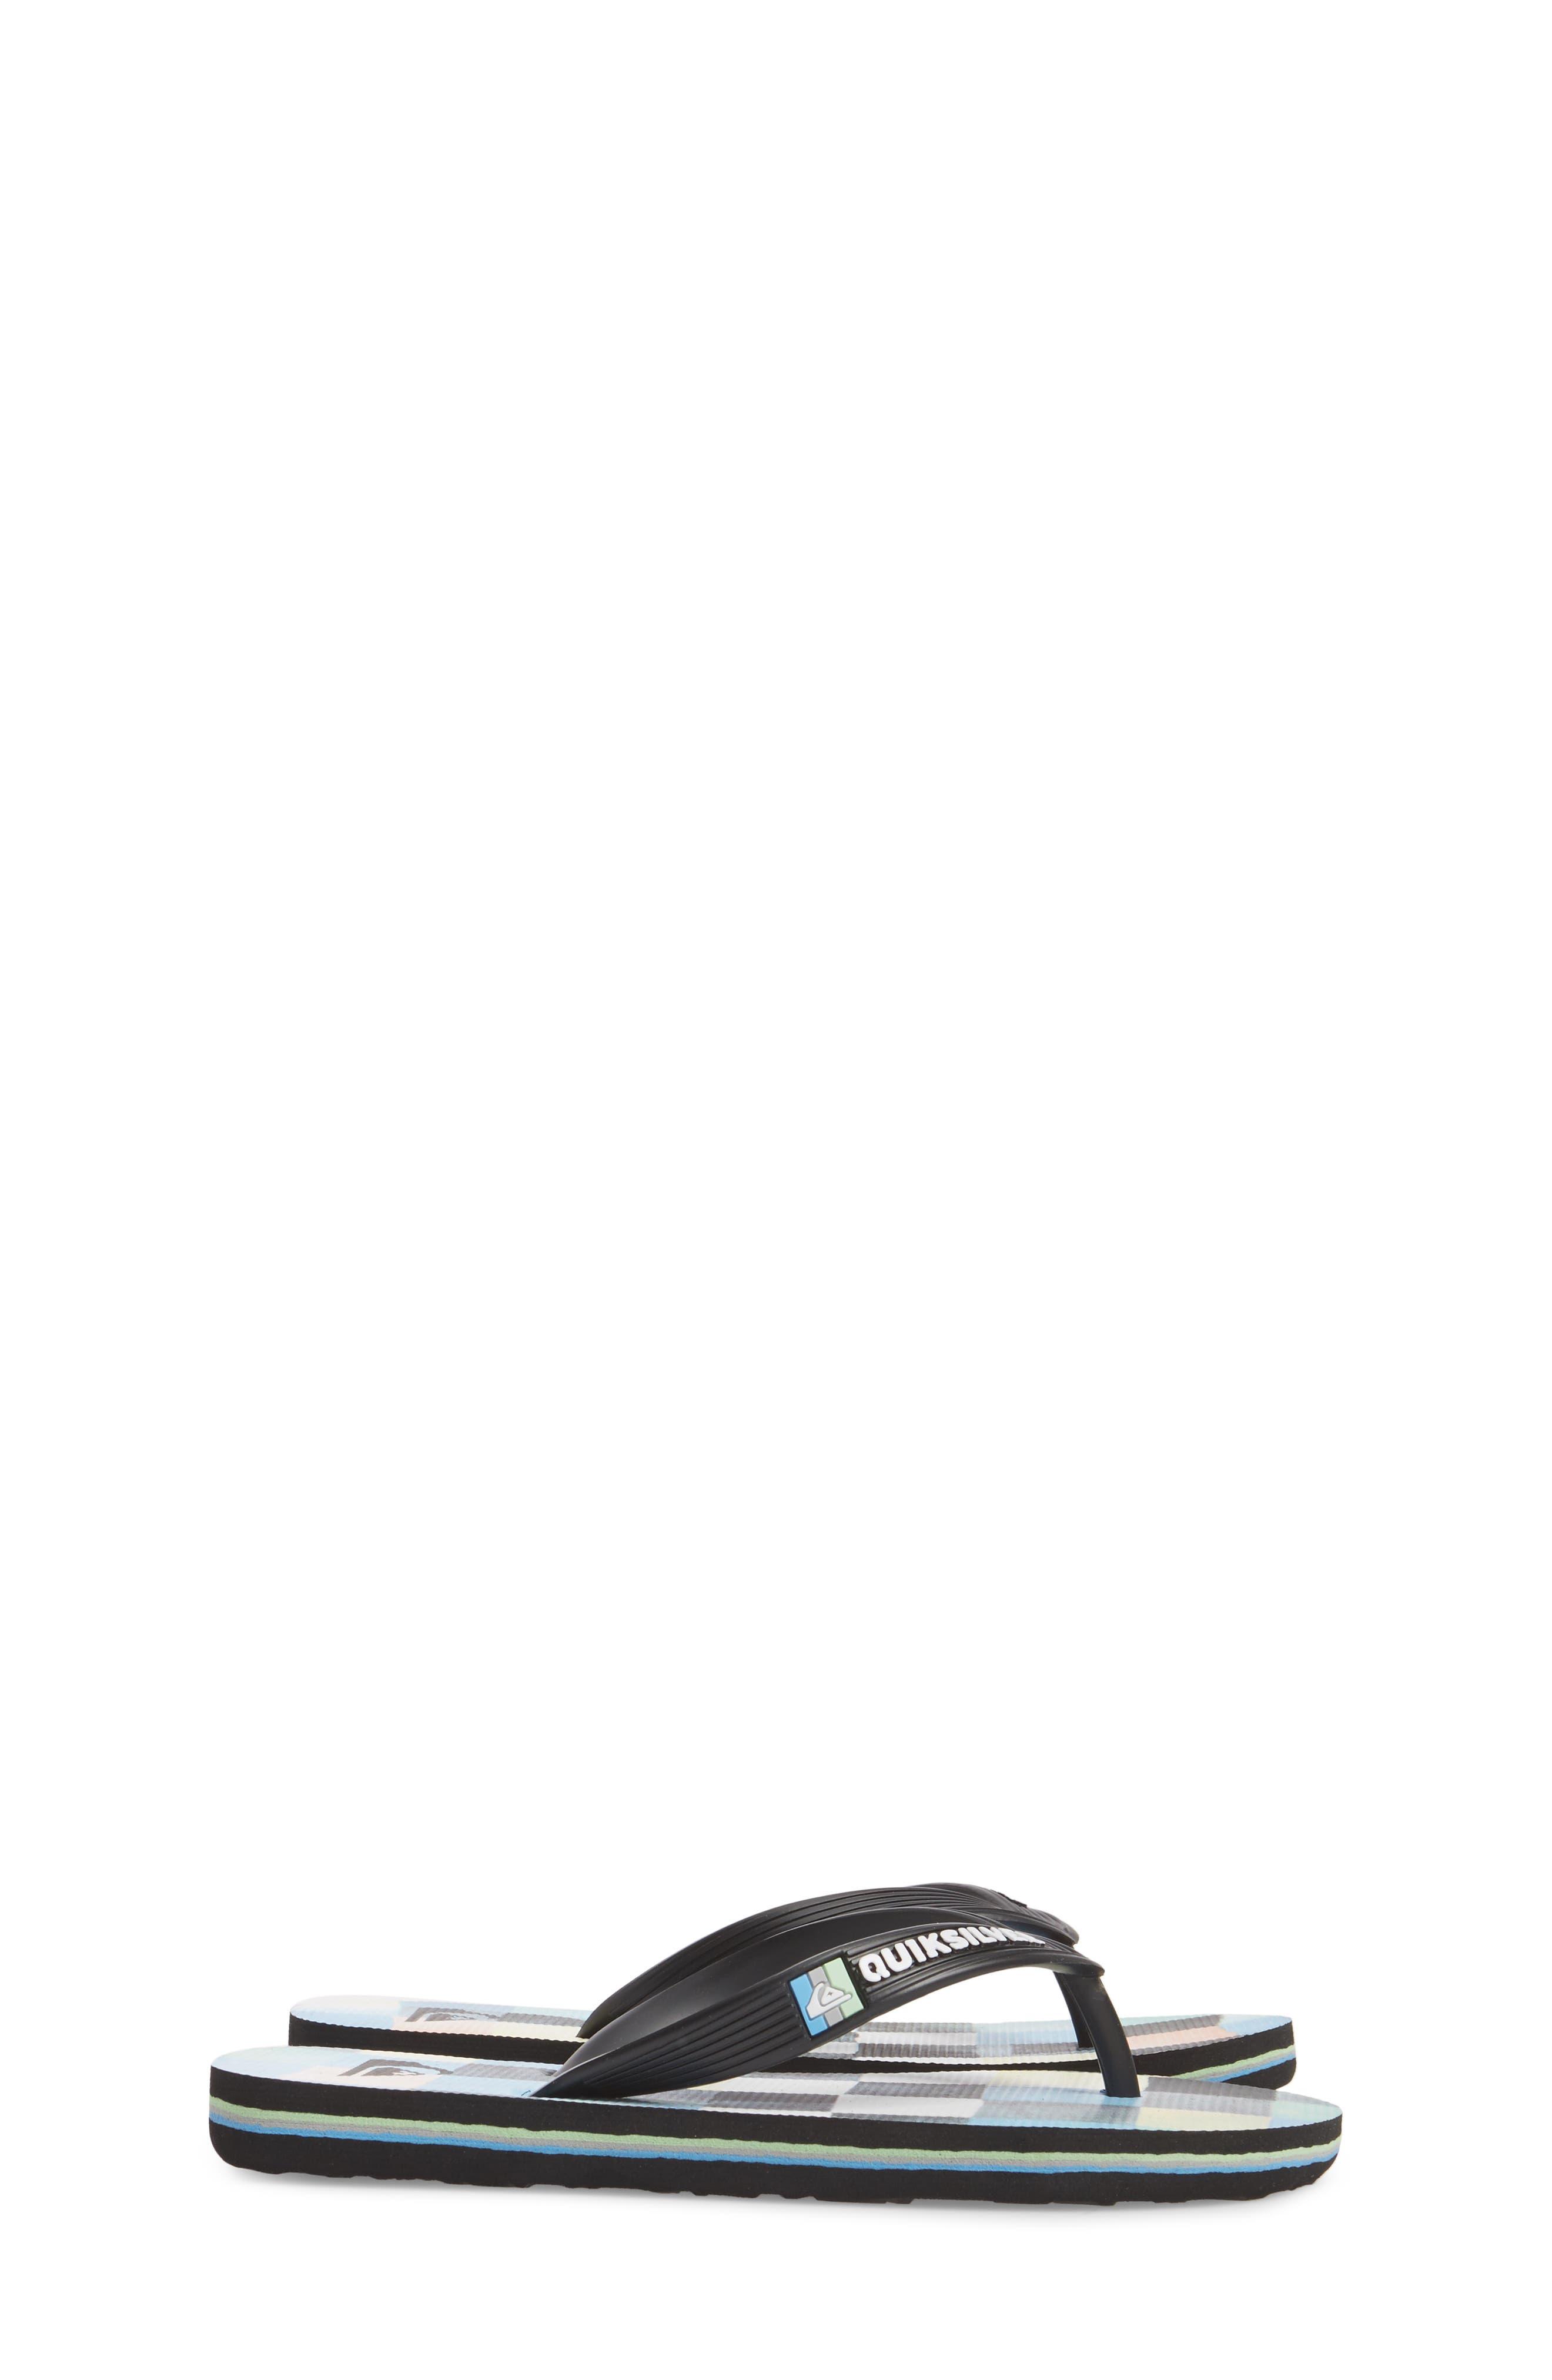 Molokai Resin Flip Flop,                             Alternate thumbnail 4, color,                             Black/ Blue/ Green